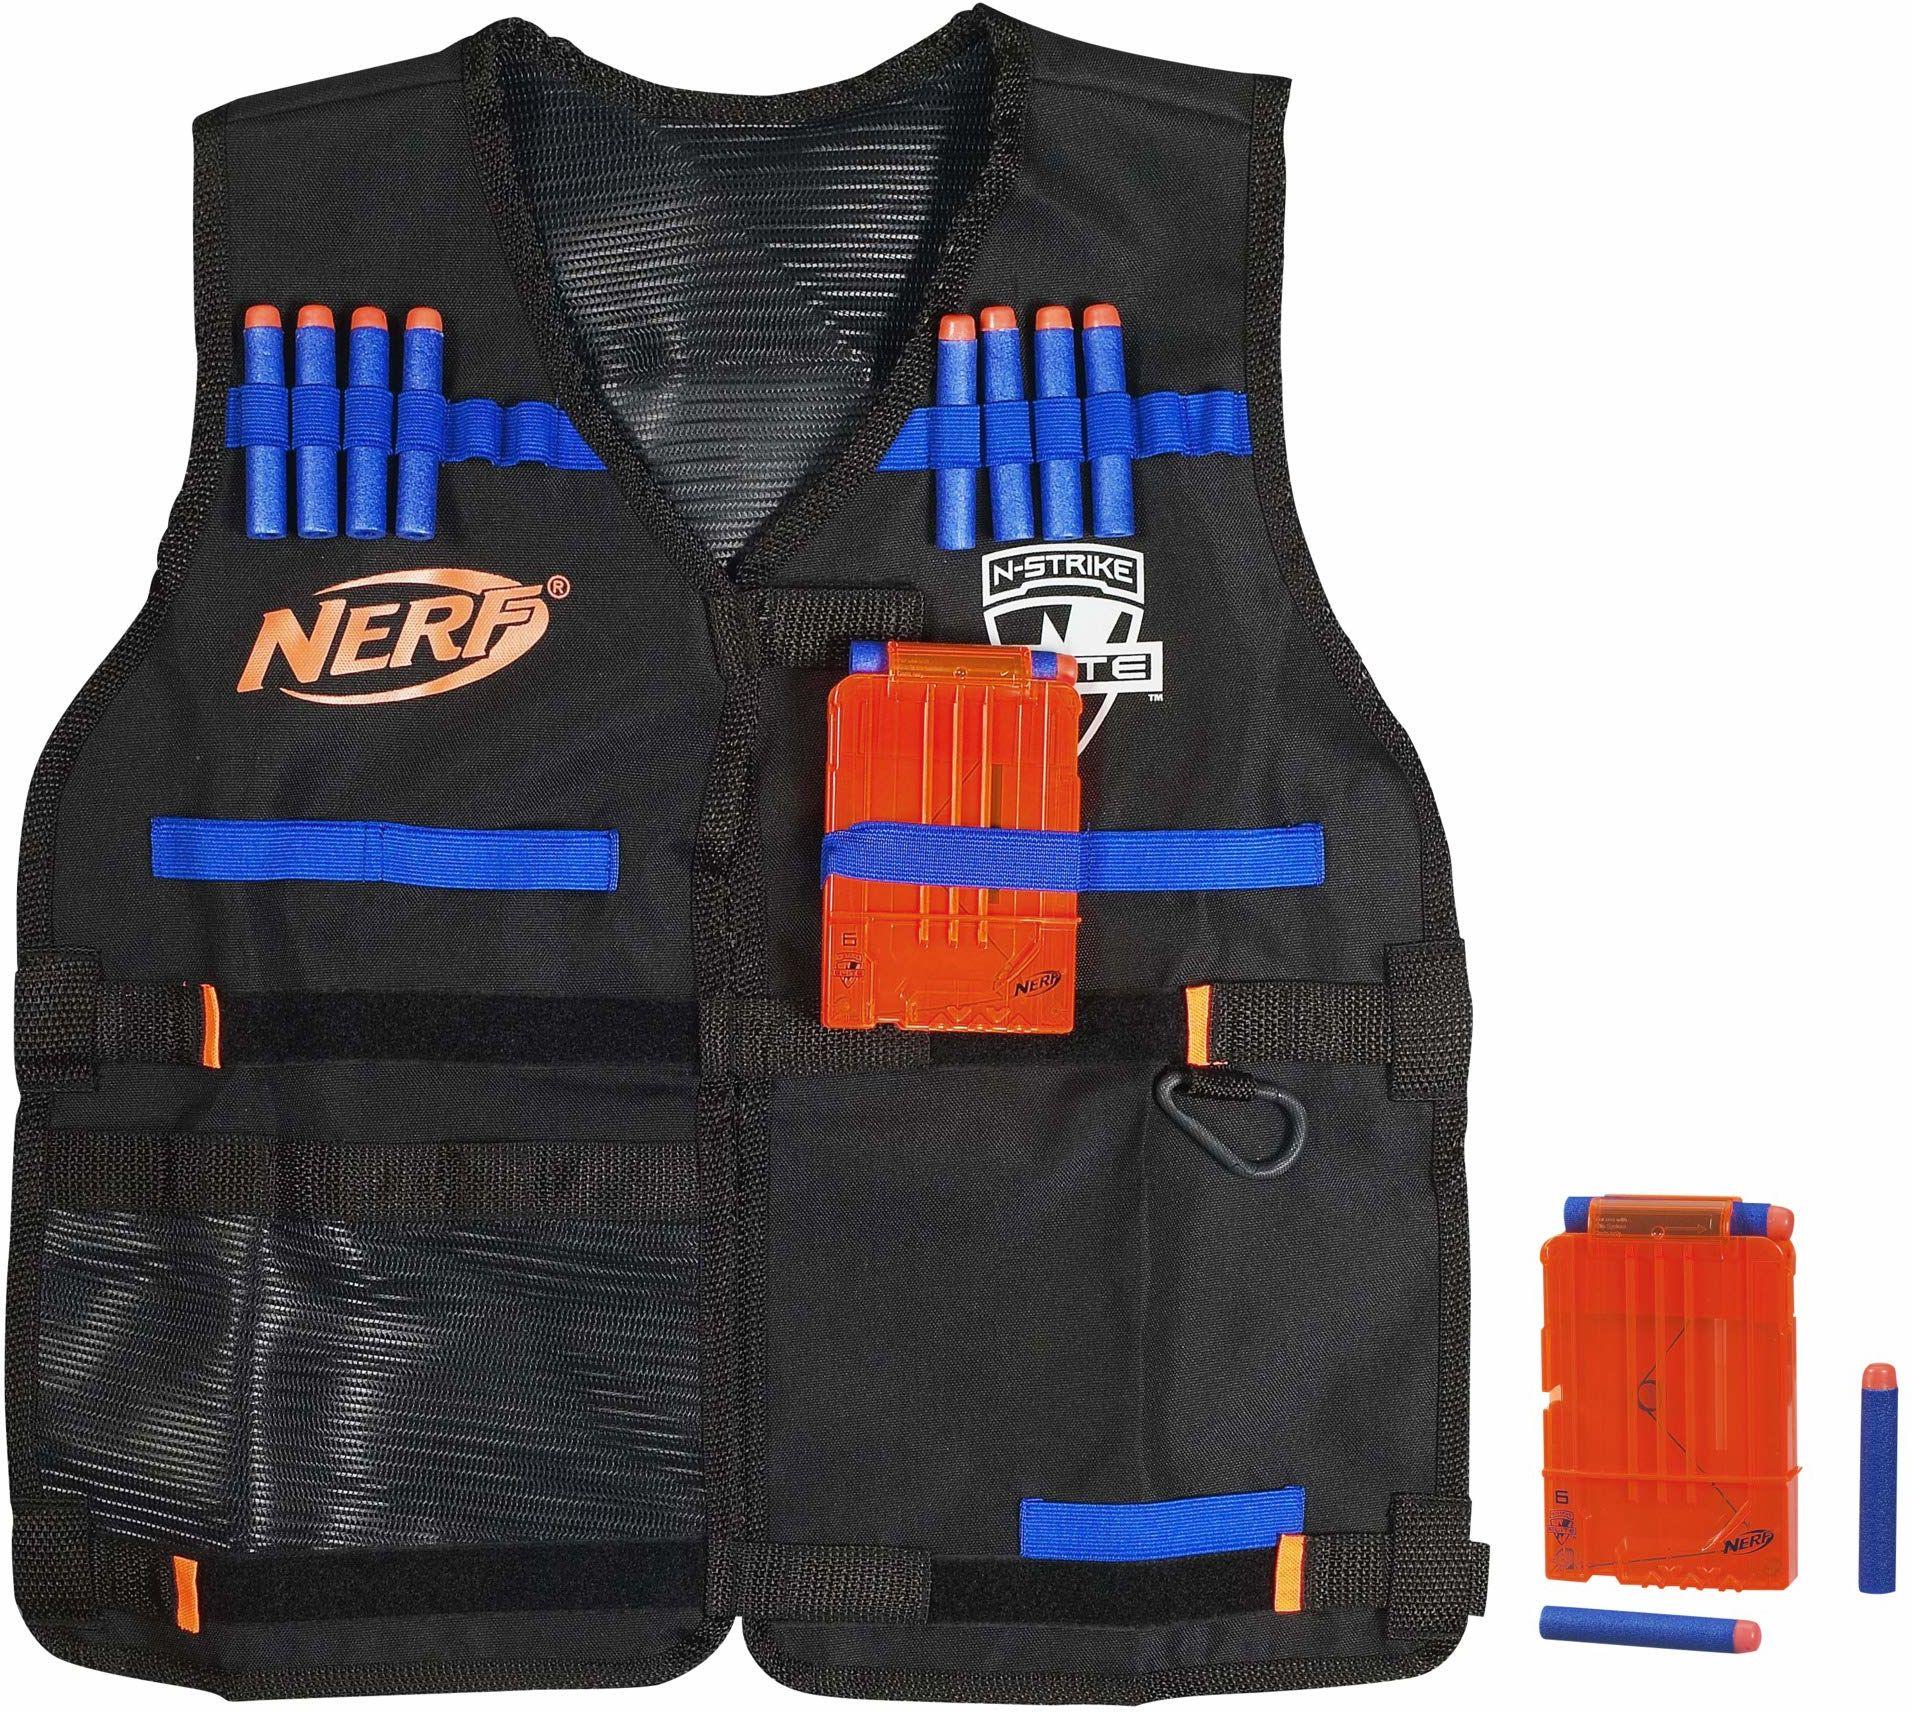 Hasbro Nerf A0250148 - N-Strike Elite Battle Weste, Nerf akcesoria